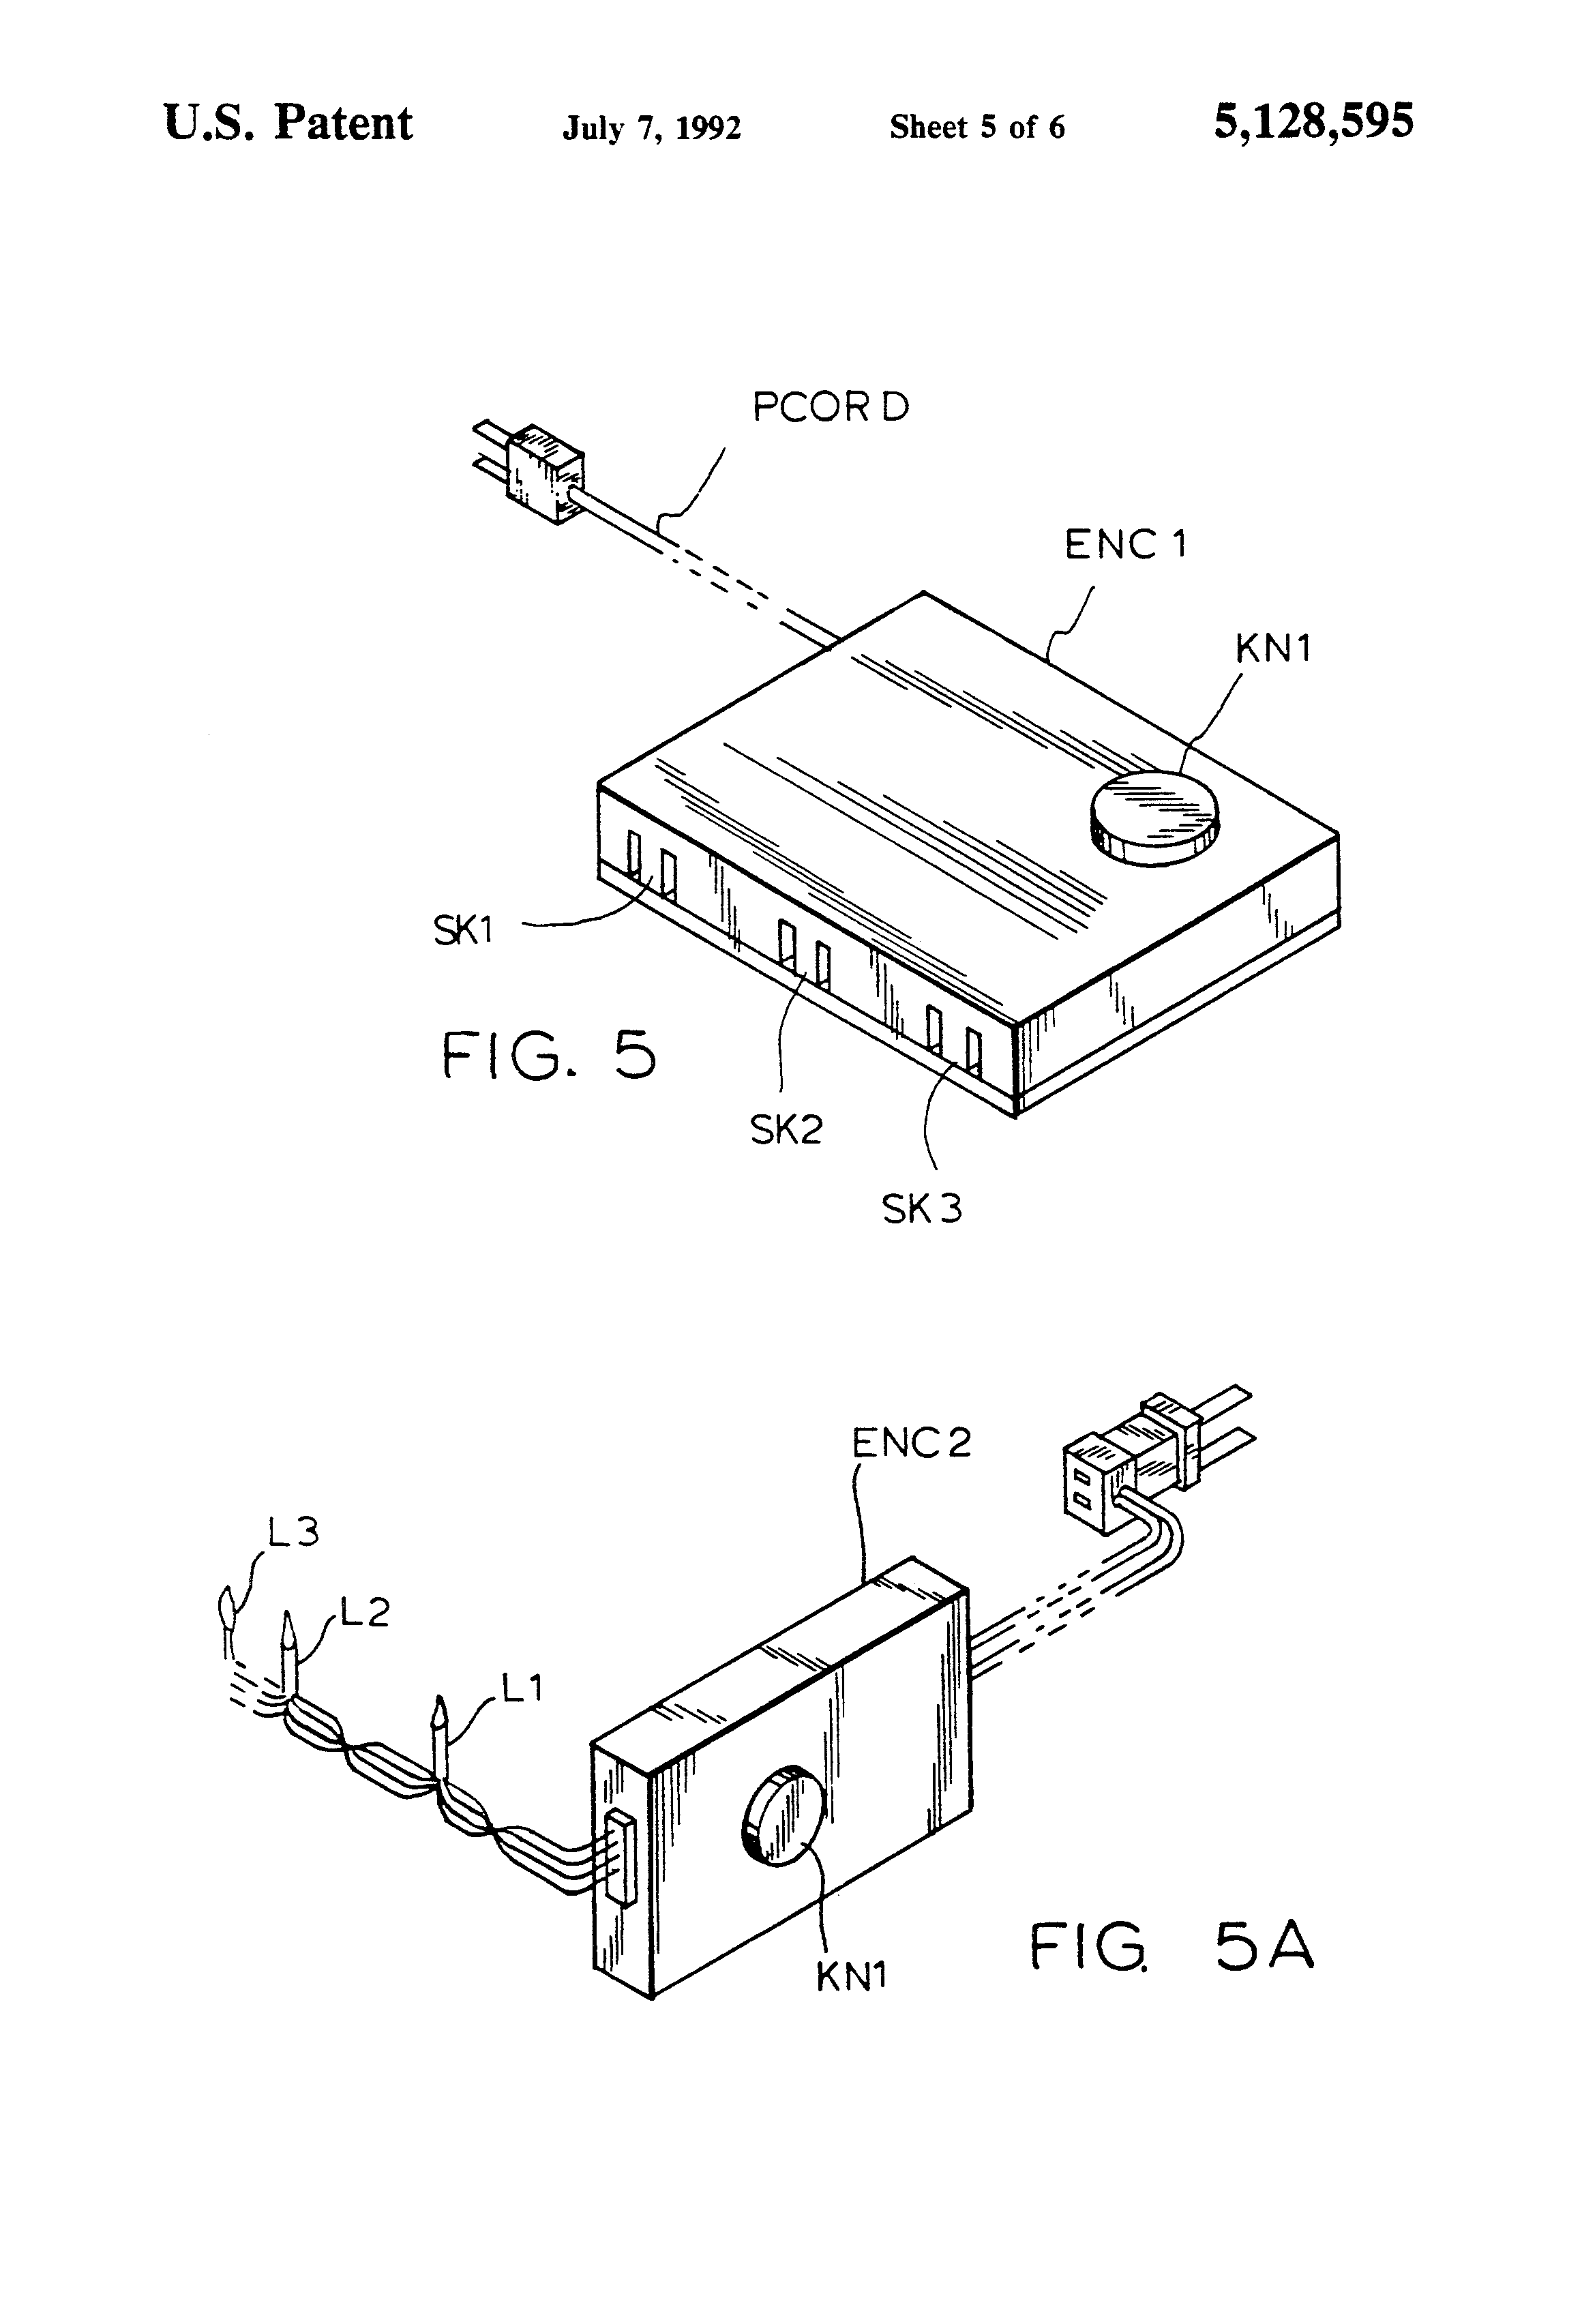 Patent Us5128595 Fader For Miniature Lights Google Patents Drive Scr Flash Circuit Diagram Powersupplycircuit Drawing